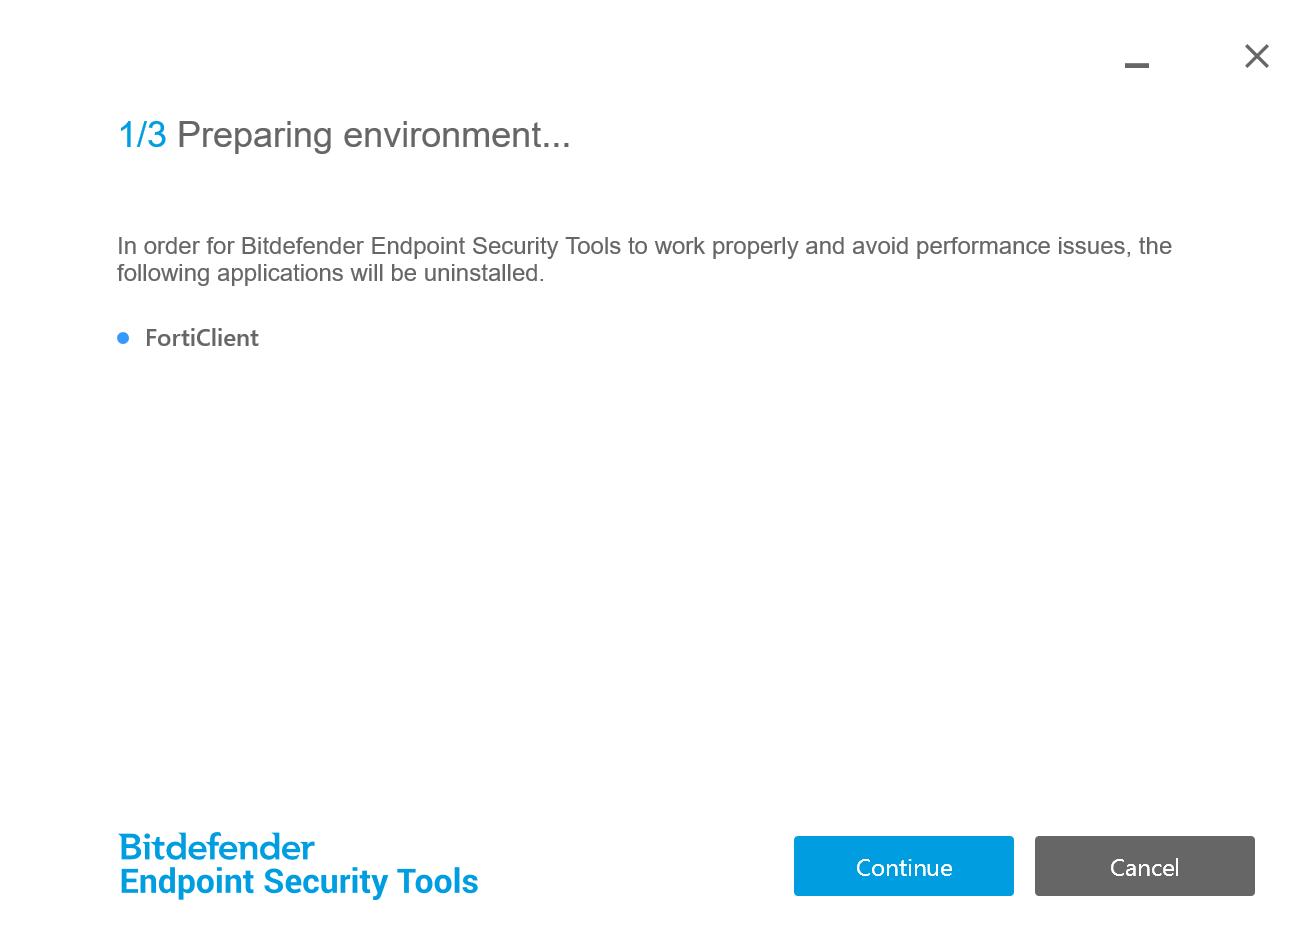 Bitdefender Gravityzone installer removes Forticlient VPN